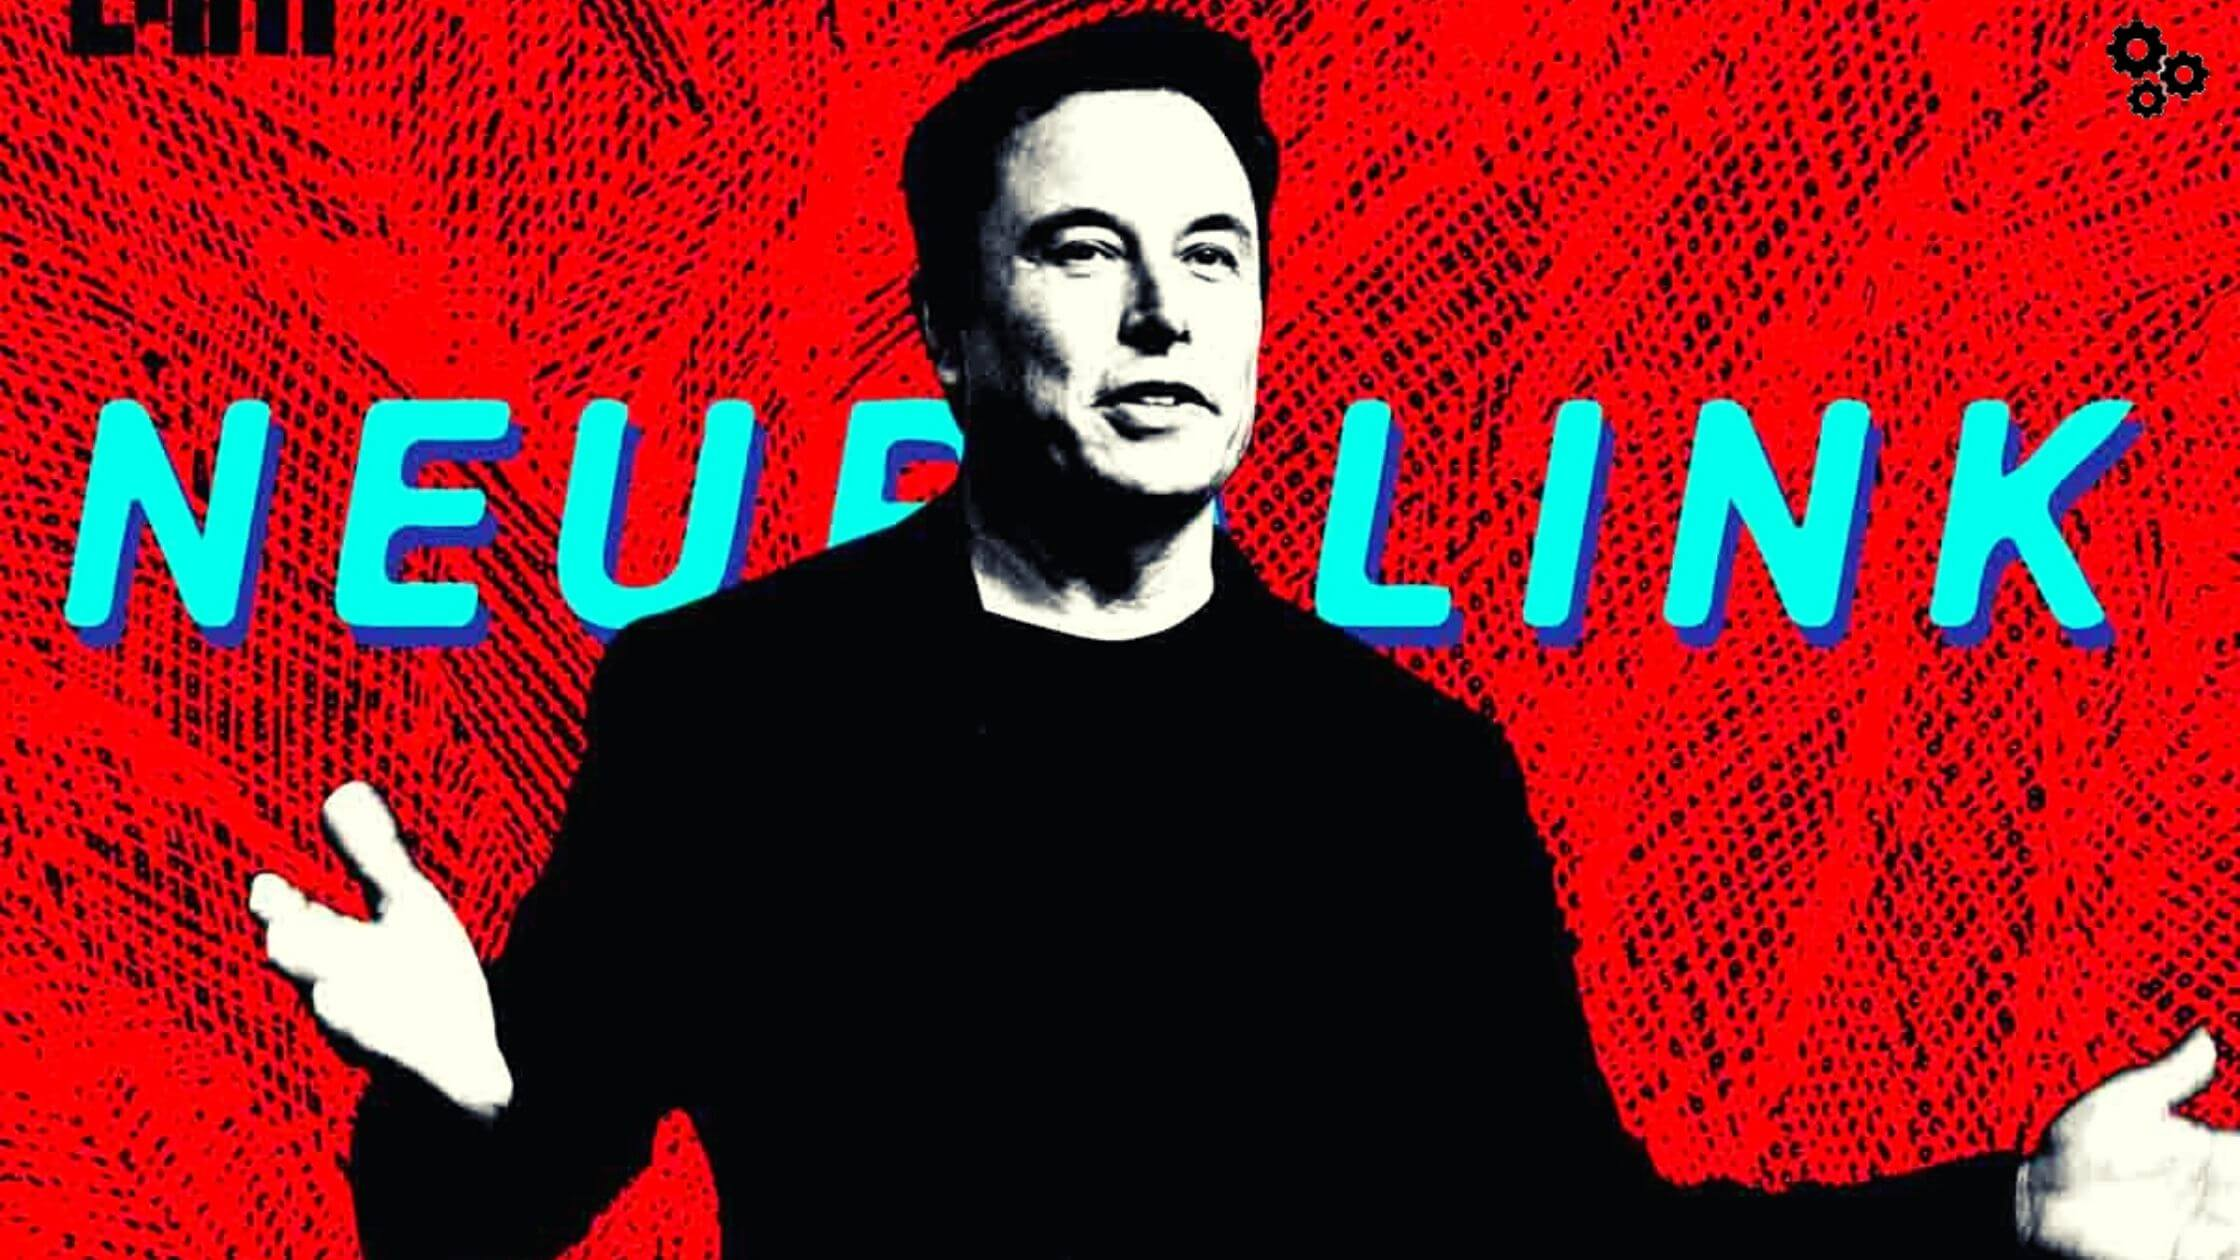 Neuralink: Elon Musk presenta gli ultimi sviluppi dell'interfaccia cervello - macchina